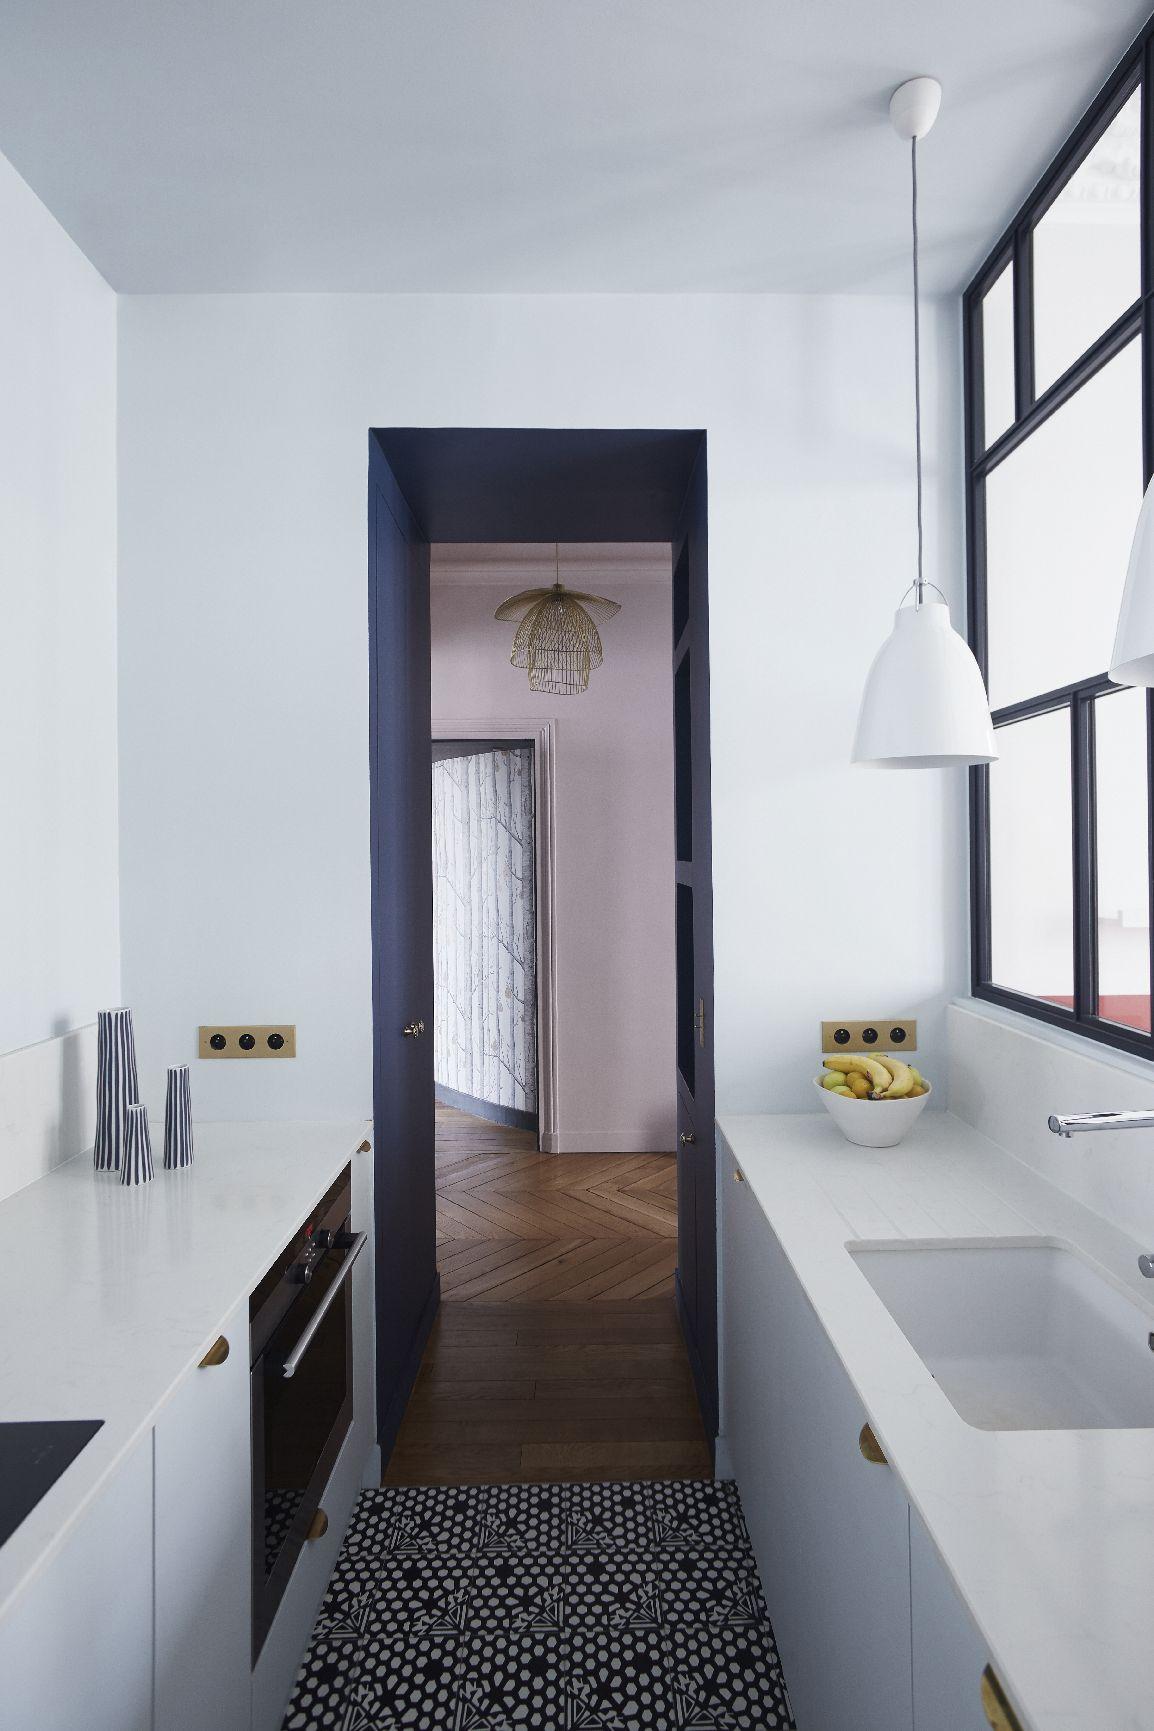 Kitchen S Project.jpg